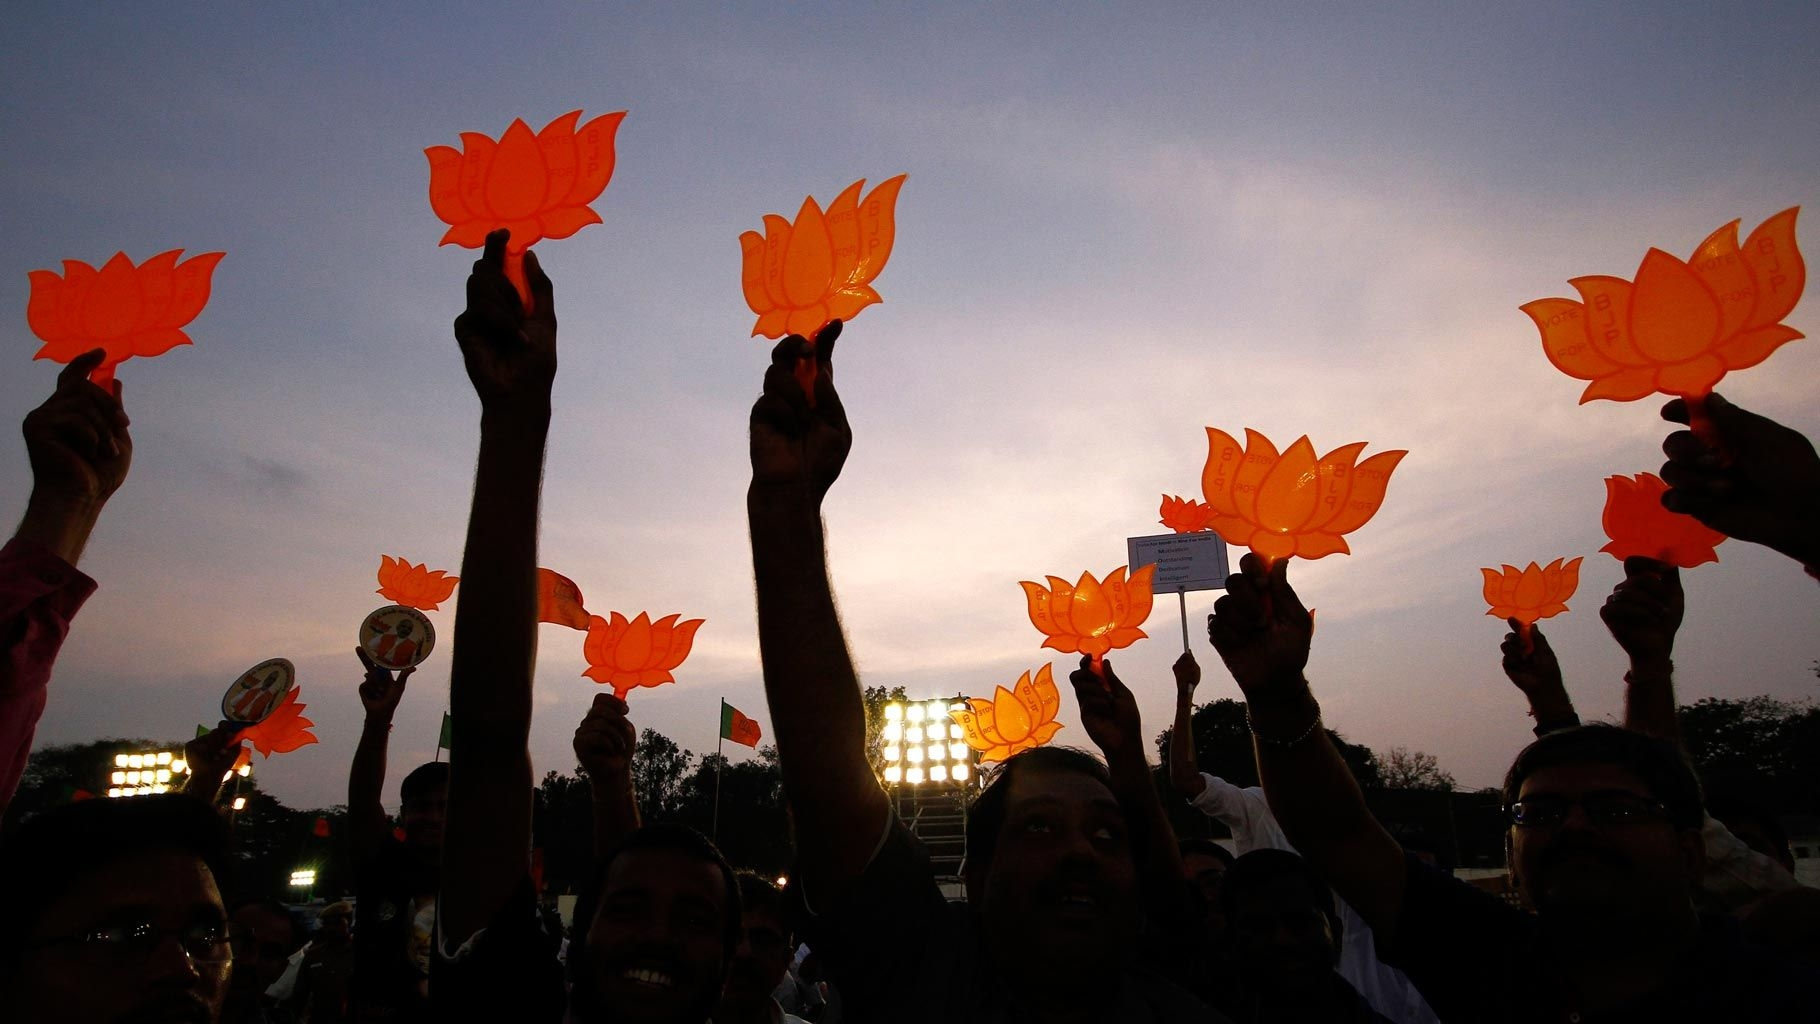 BJP Gains in 170 Assembly Segments, Fresh Polls on Card in K'taka